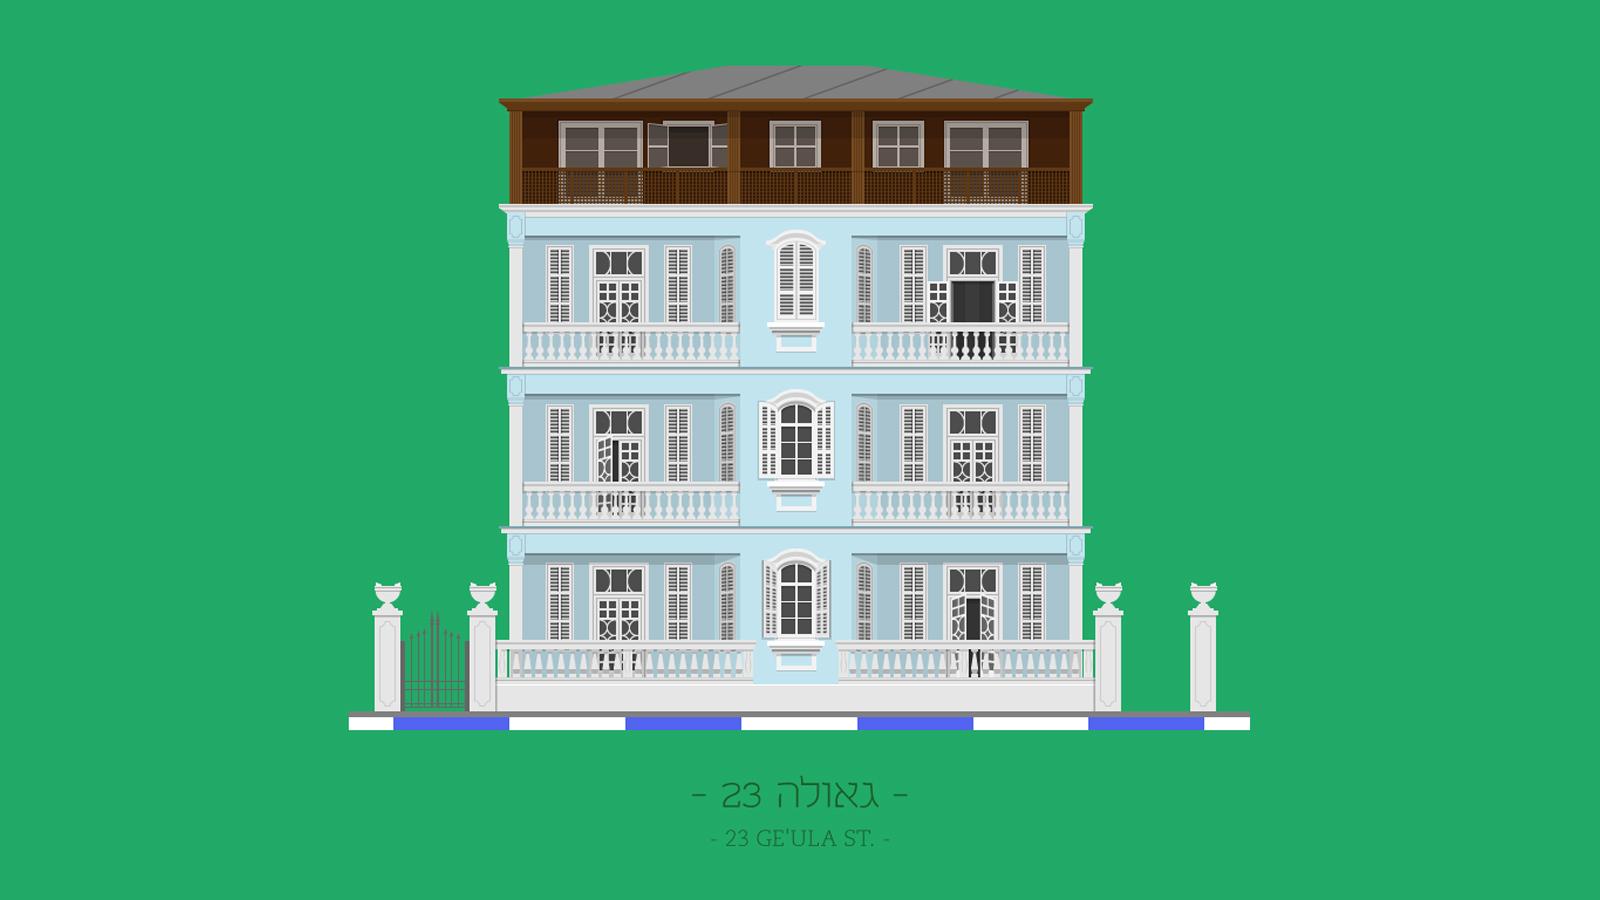 tel-aviv-buildings-7_1600x900